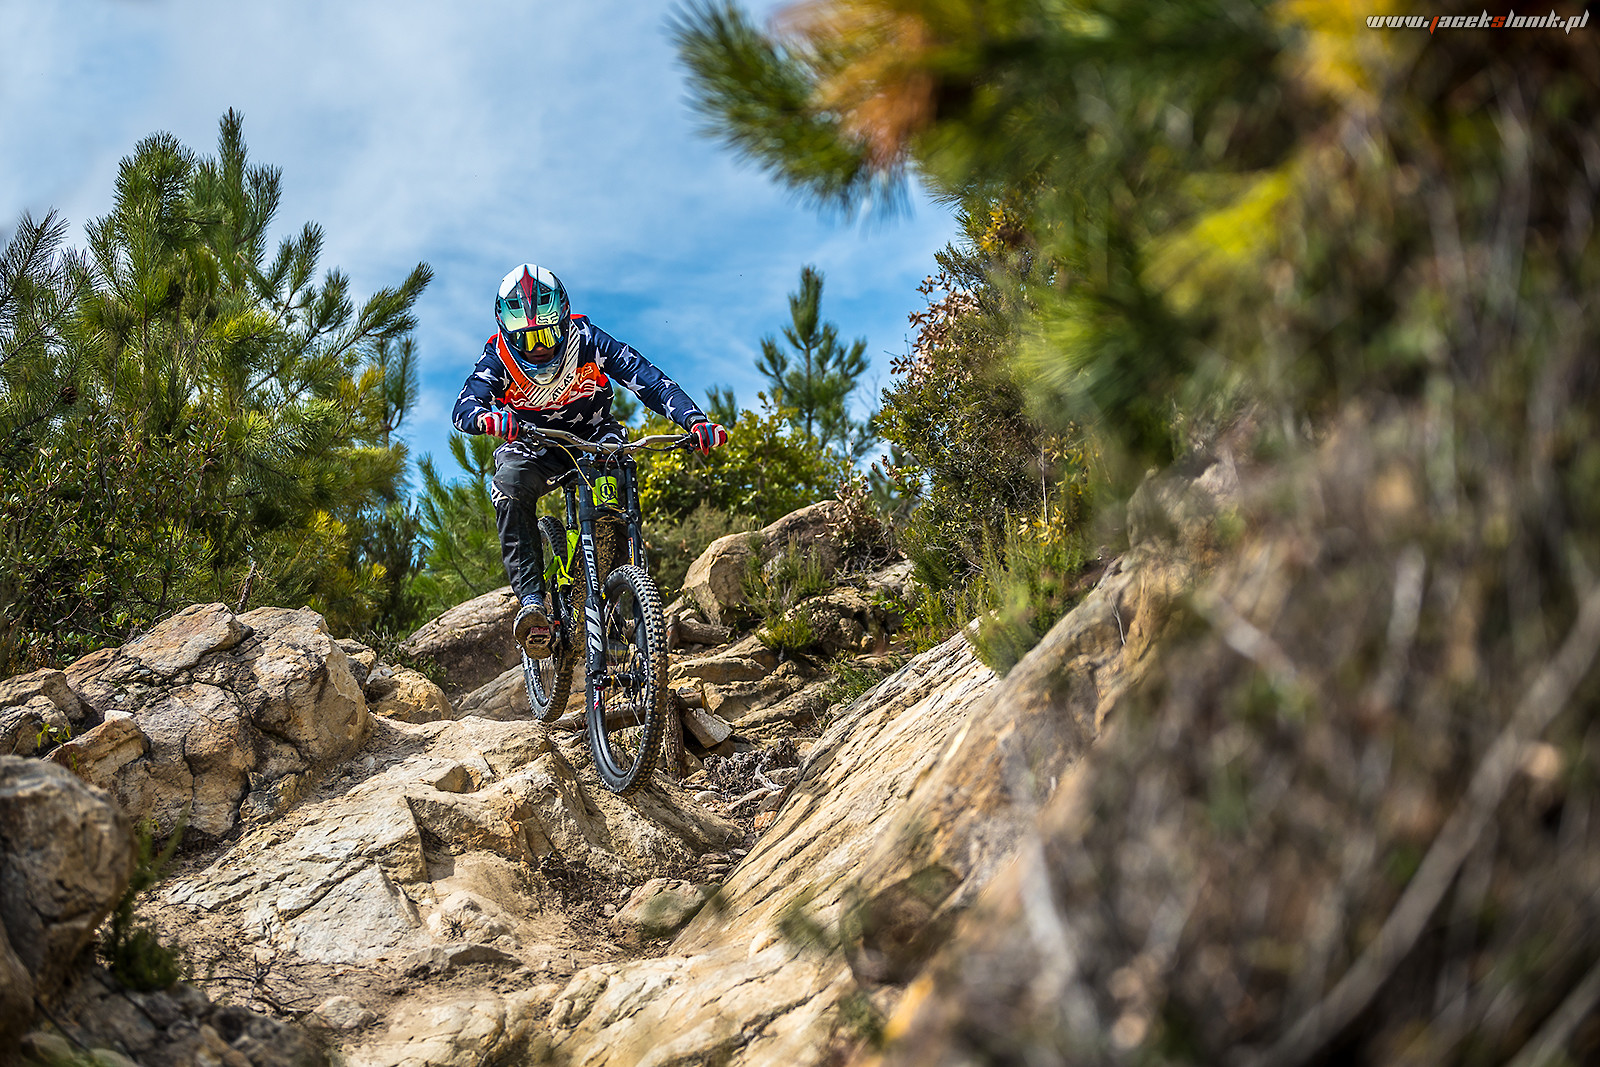 Freeride track in SanRemo - JacekSlonik - Mountain Biking Pictures - Vital MTB